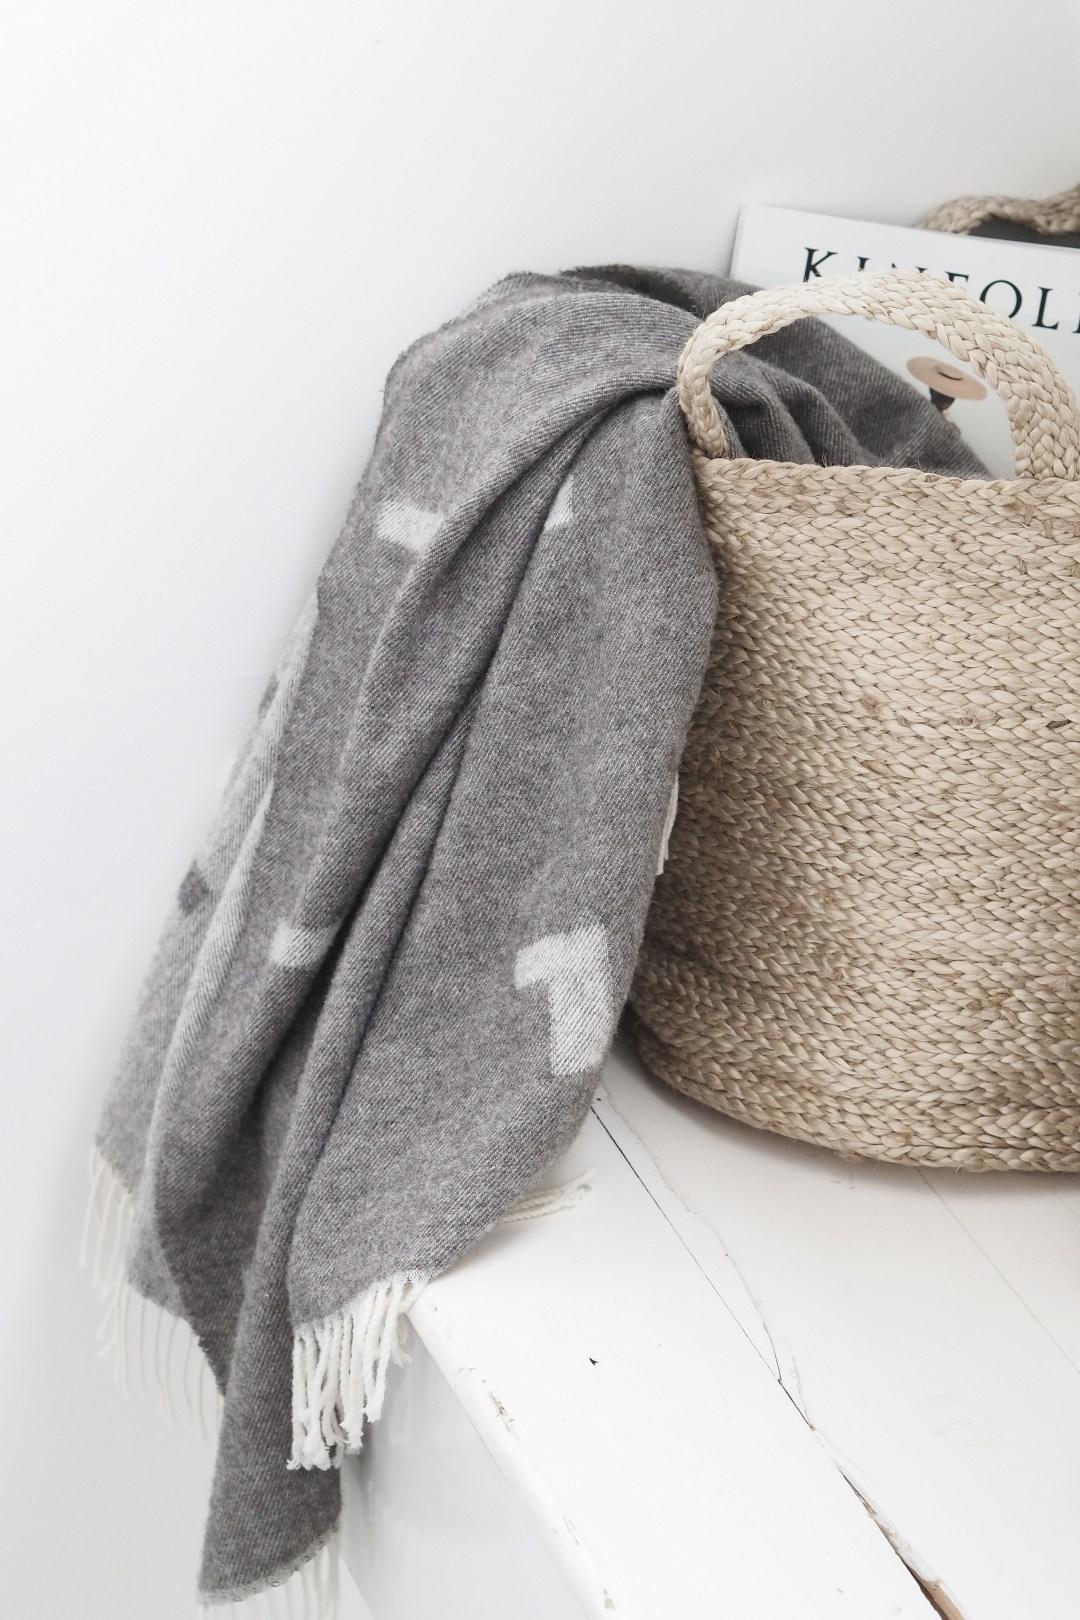 Woven baskets, Scandi storage